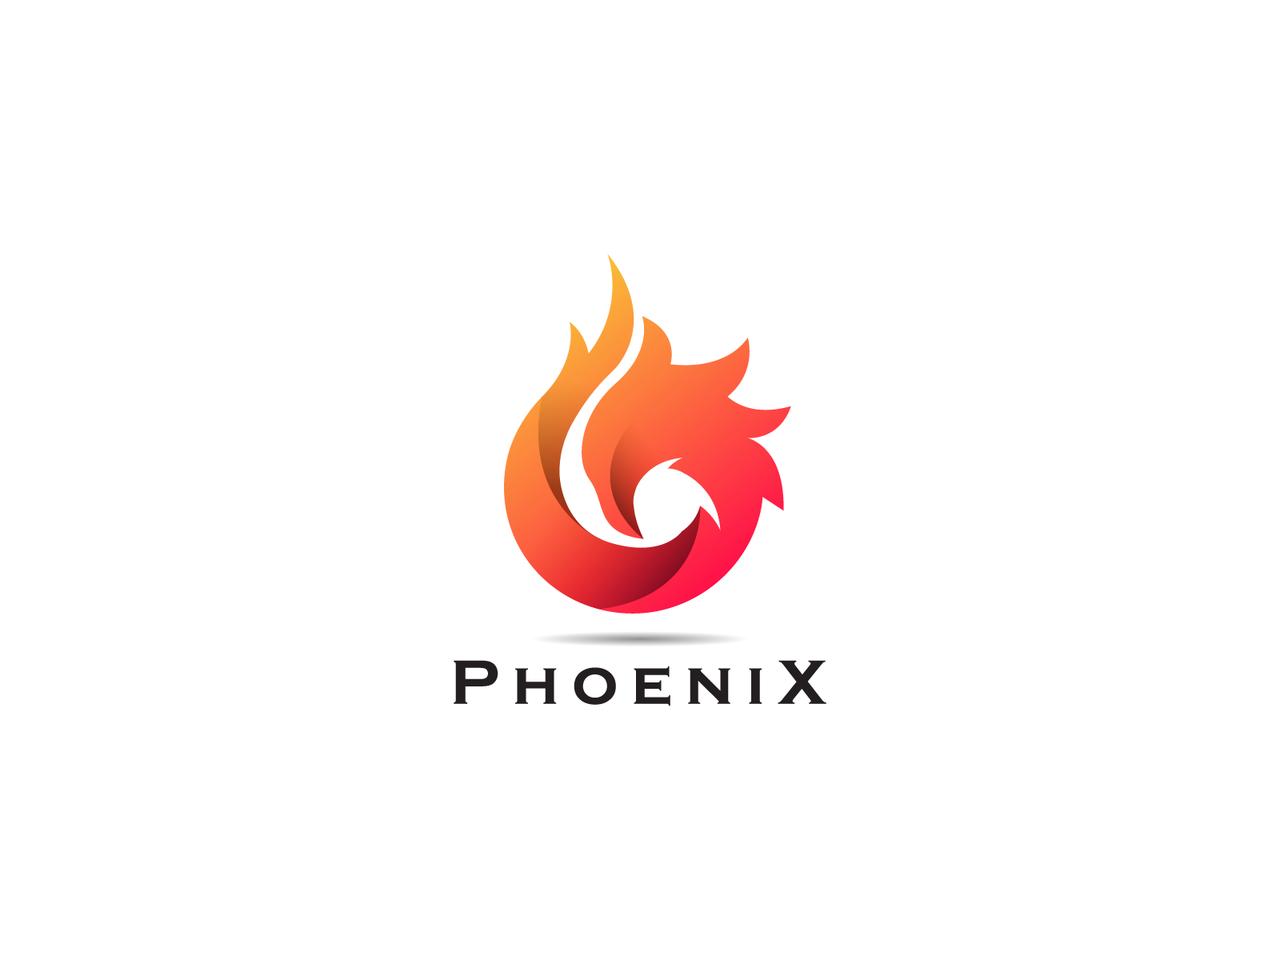 Phoenix gradient logo design